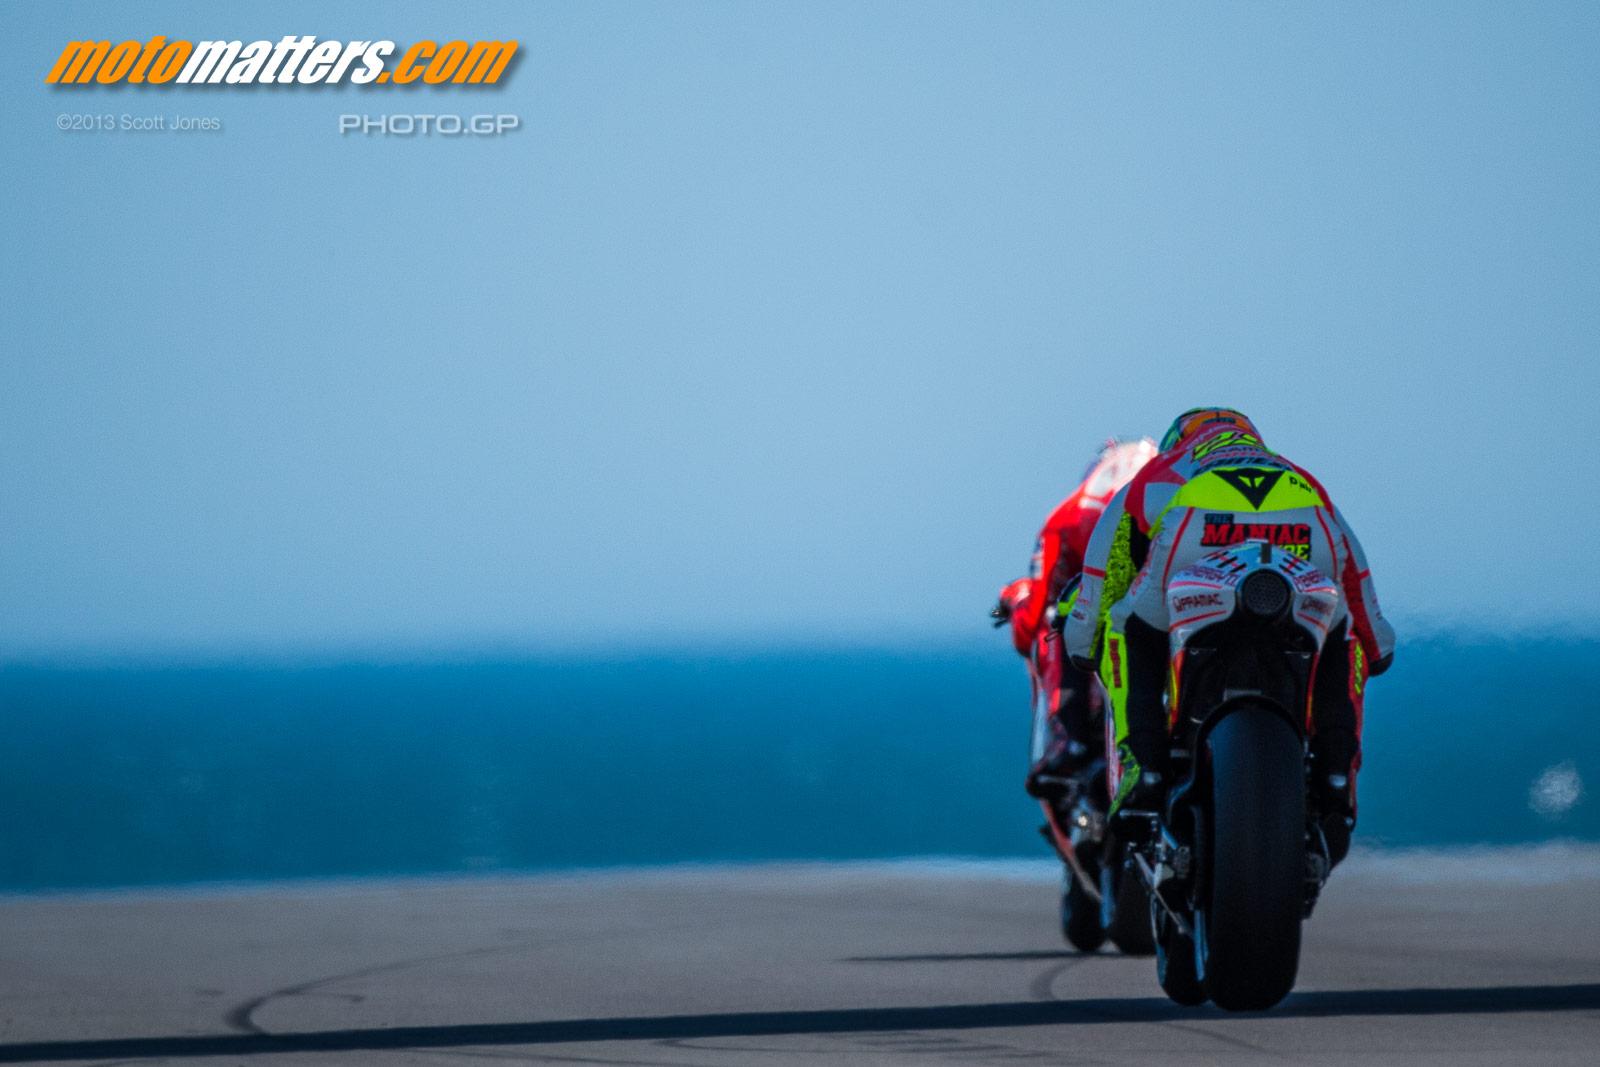 GP Phillip Island - Page 4 2013-MotoGP-16-Phillip-Island-Friday-1148-O